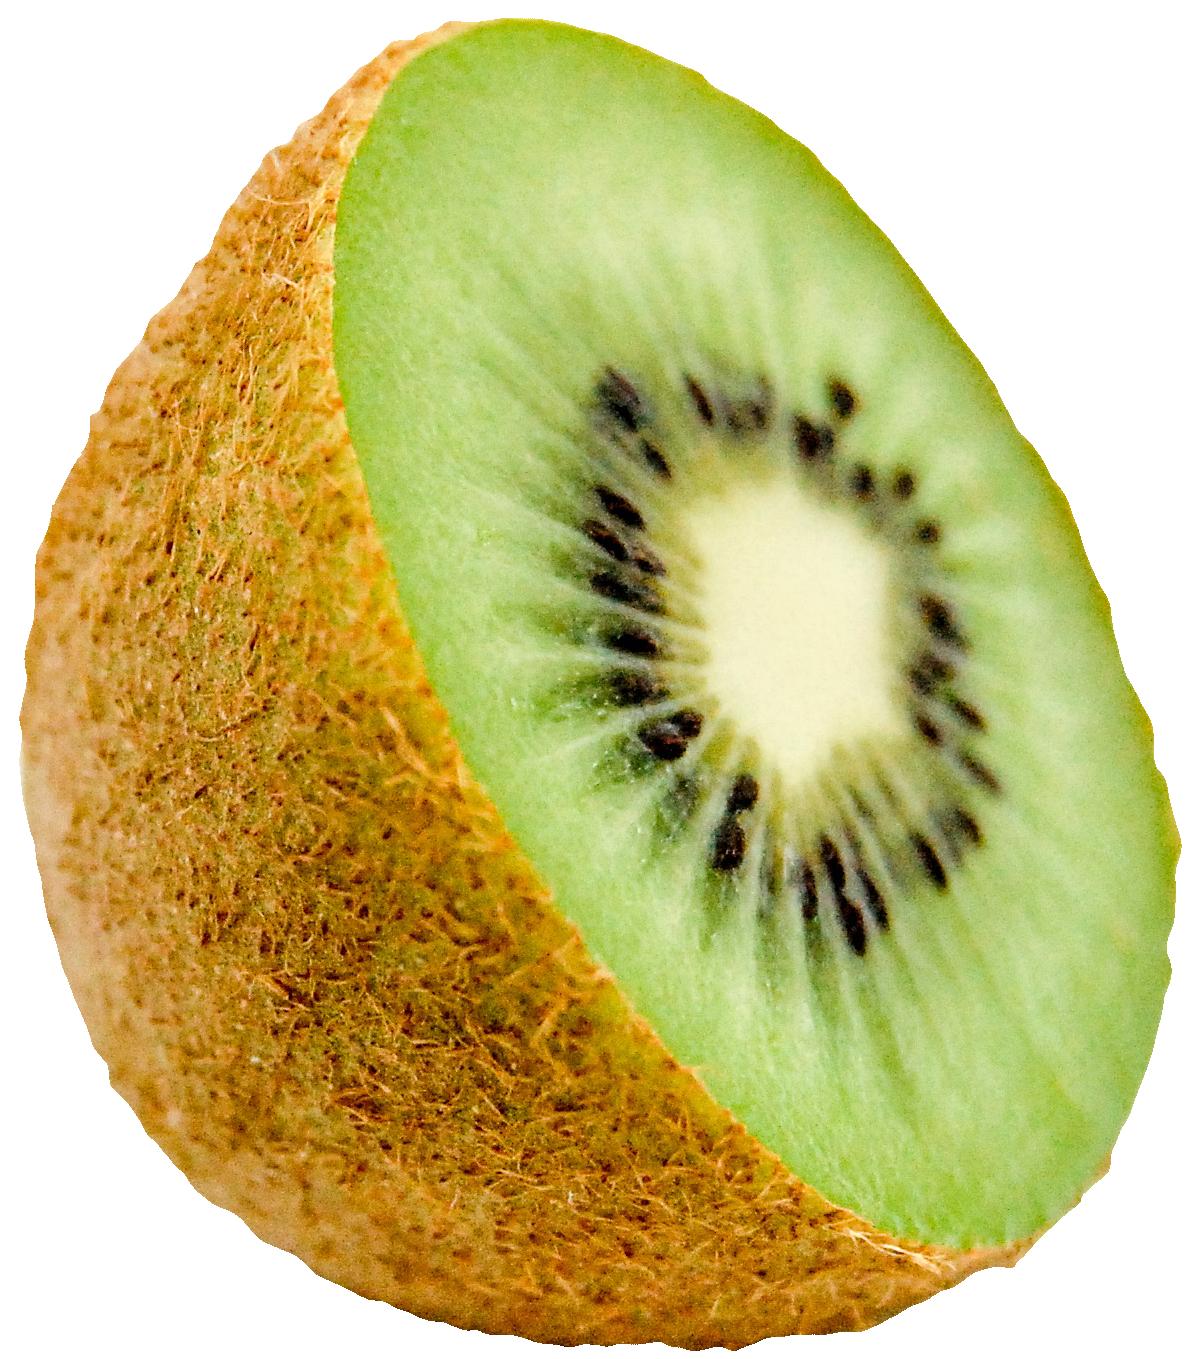 Kiwi clipart large. Png image purepng free